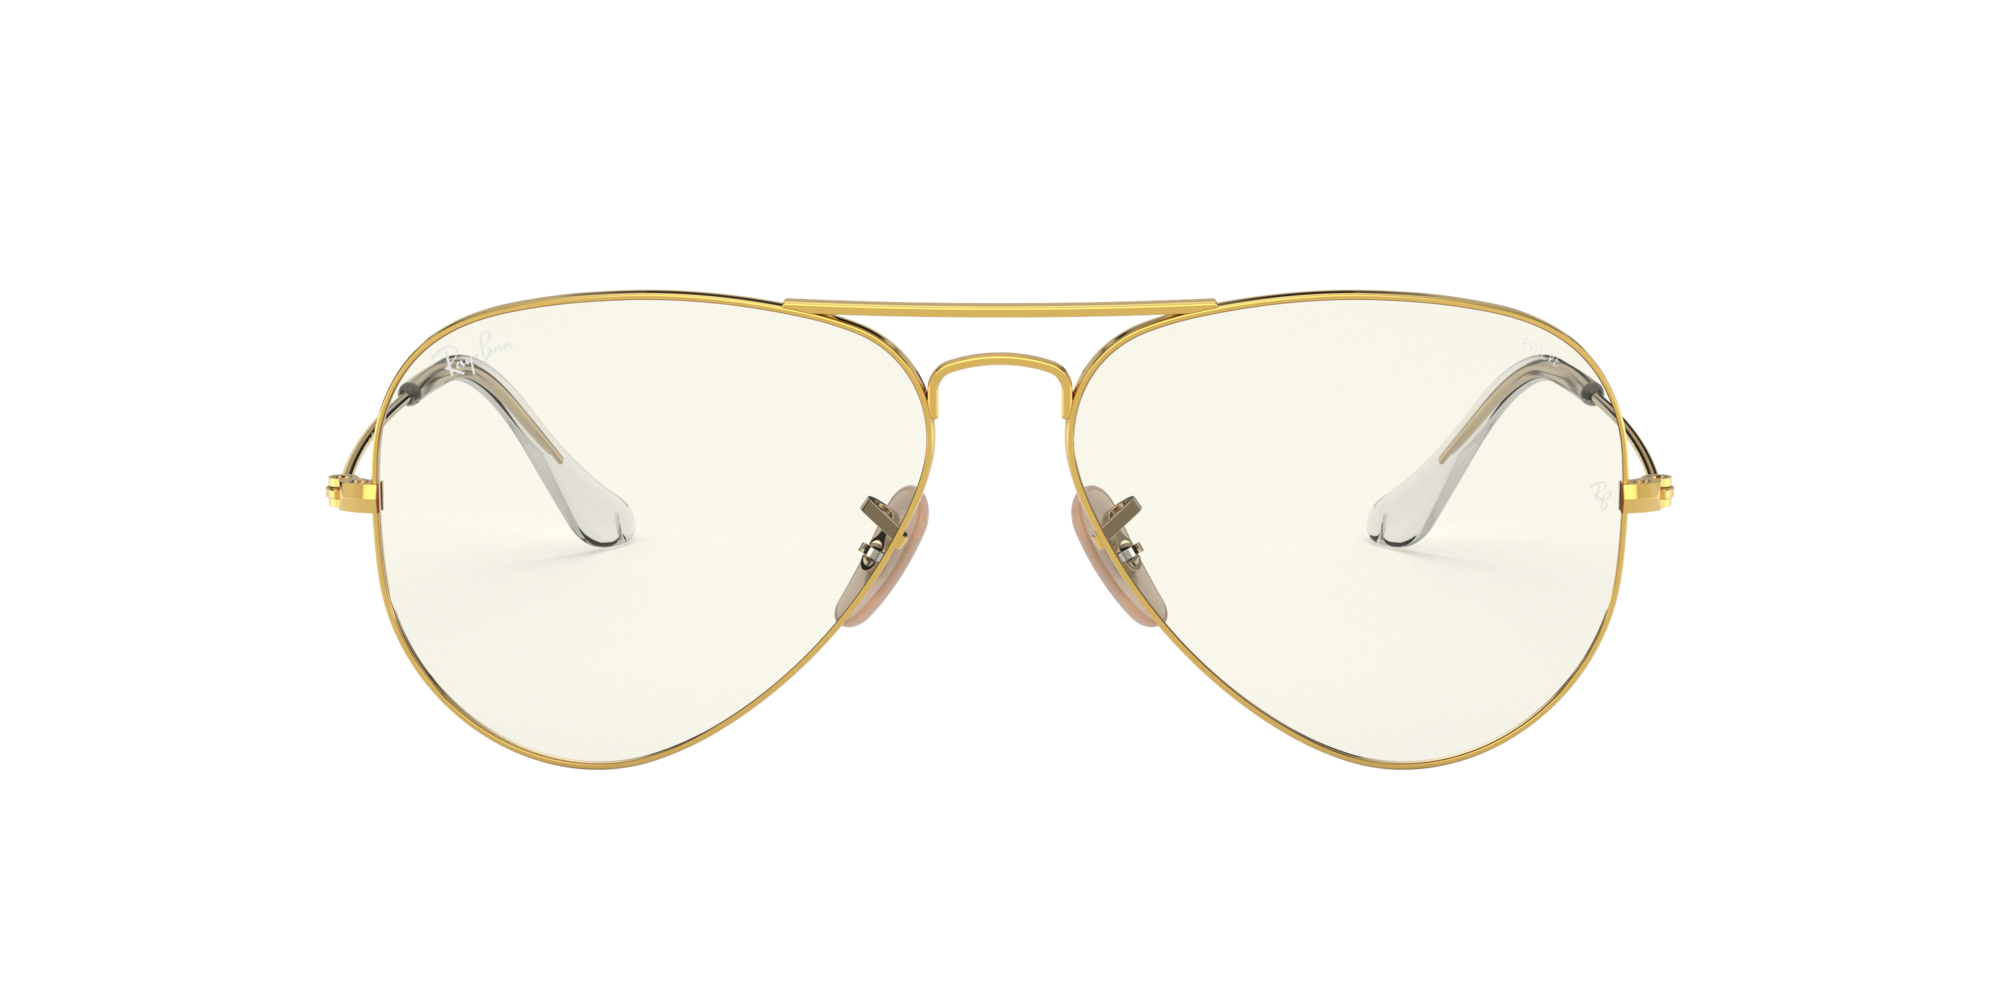 Image de RB3025 58 AVIATOR LARGE METAL from LensCrafters | Lunettes, lunettes d'ordonnance en ligne, lunetterie